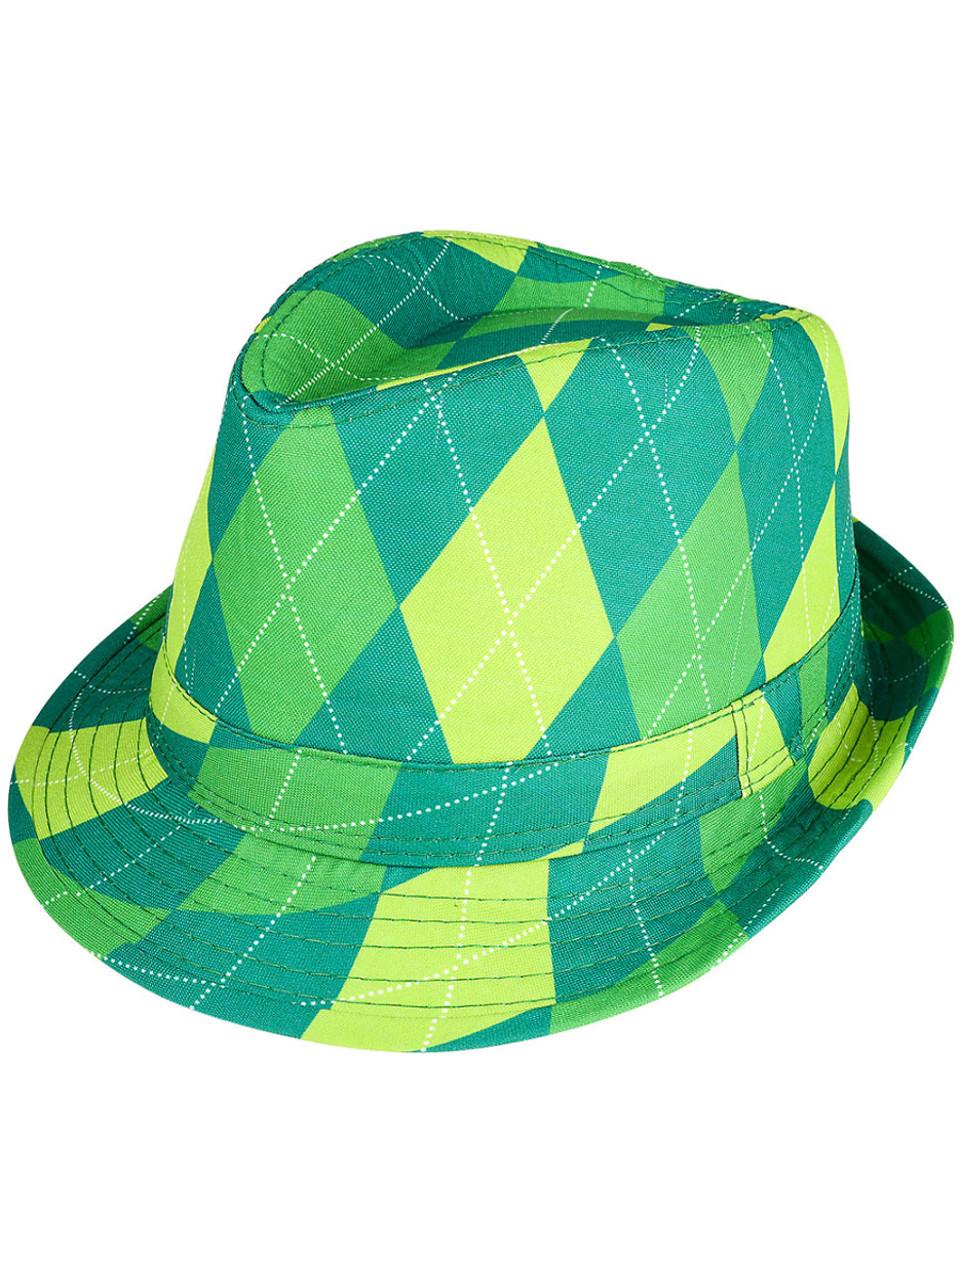 97d85f1d17250a Adults Saint Patrick's Day Gangster Irish Plaid Fedora Hat Costume Accessory